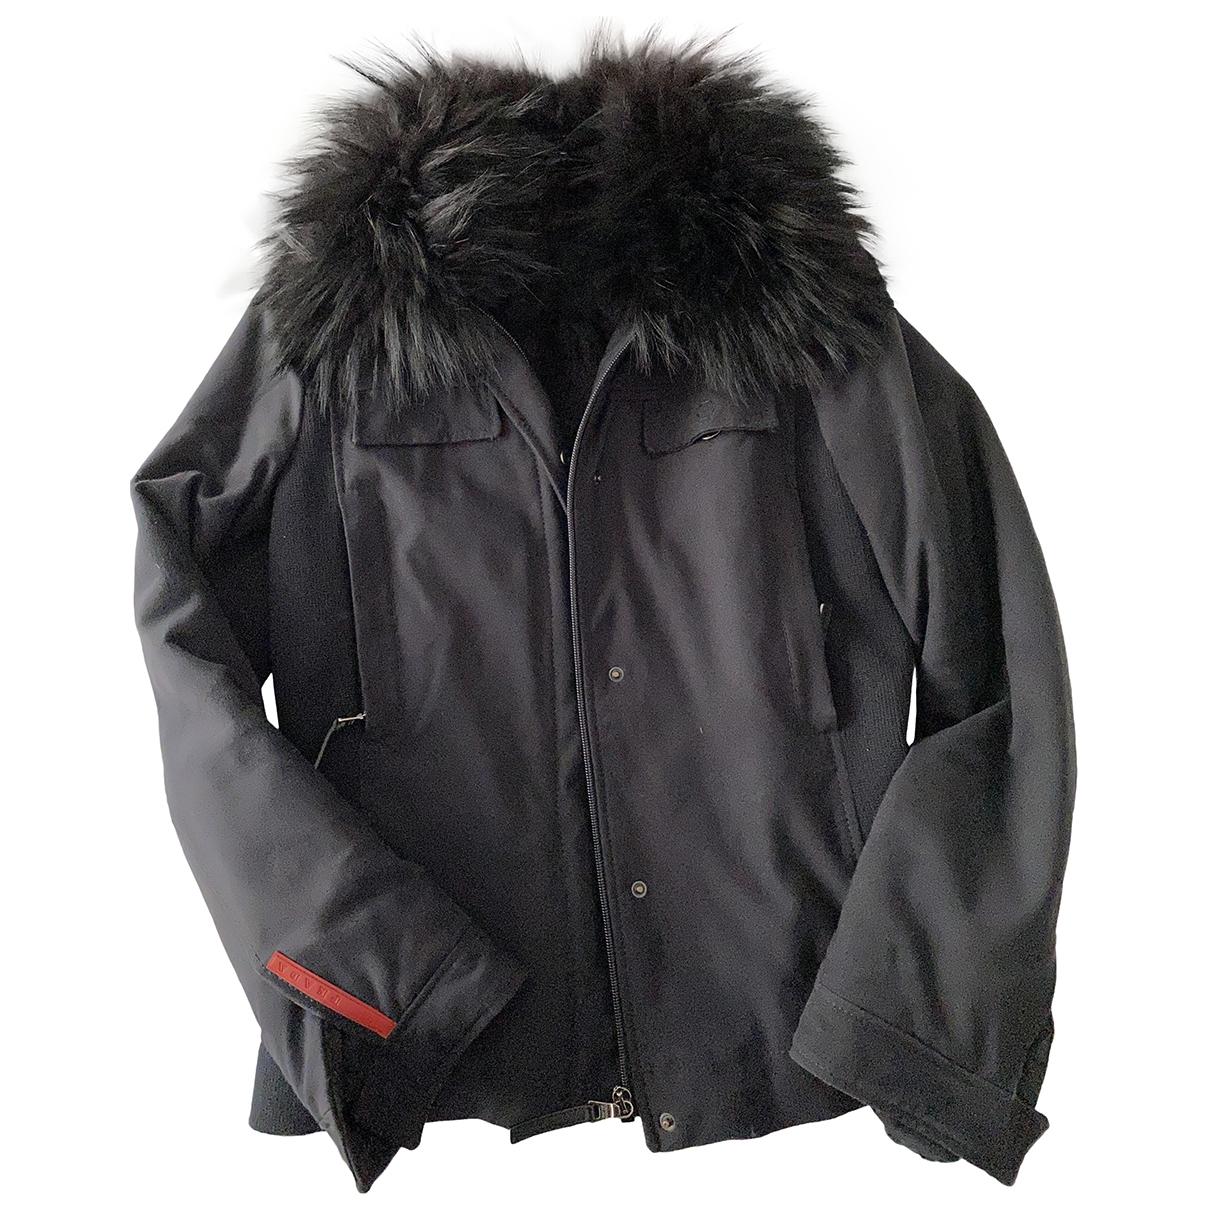 Prada \N Black Leather jacket for Women 40 IT